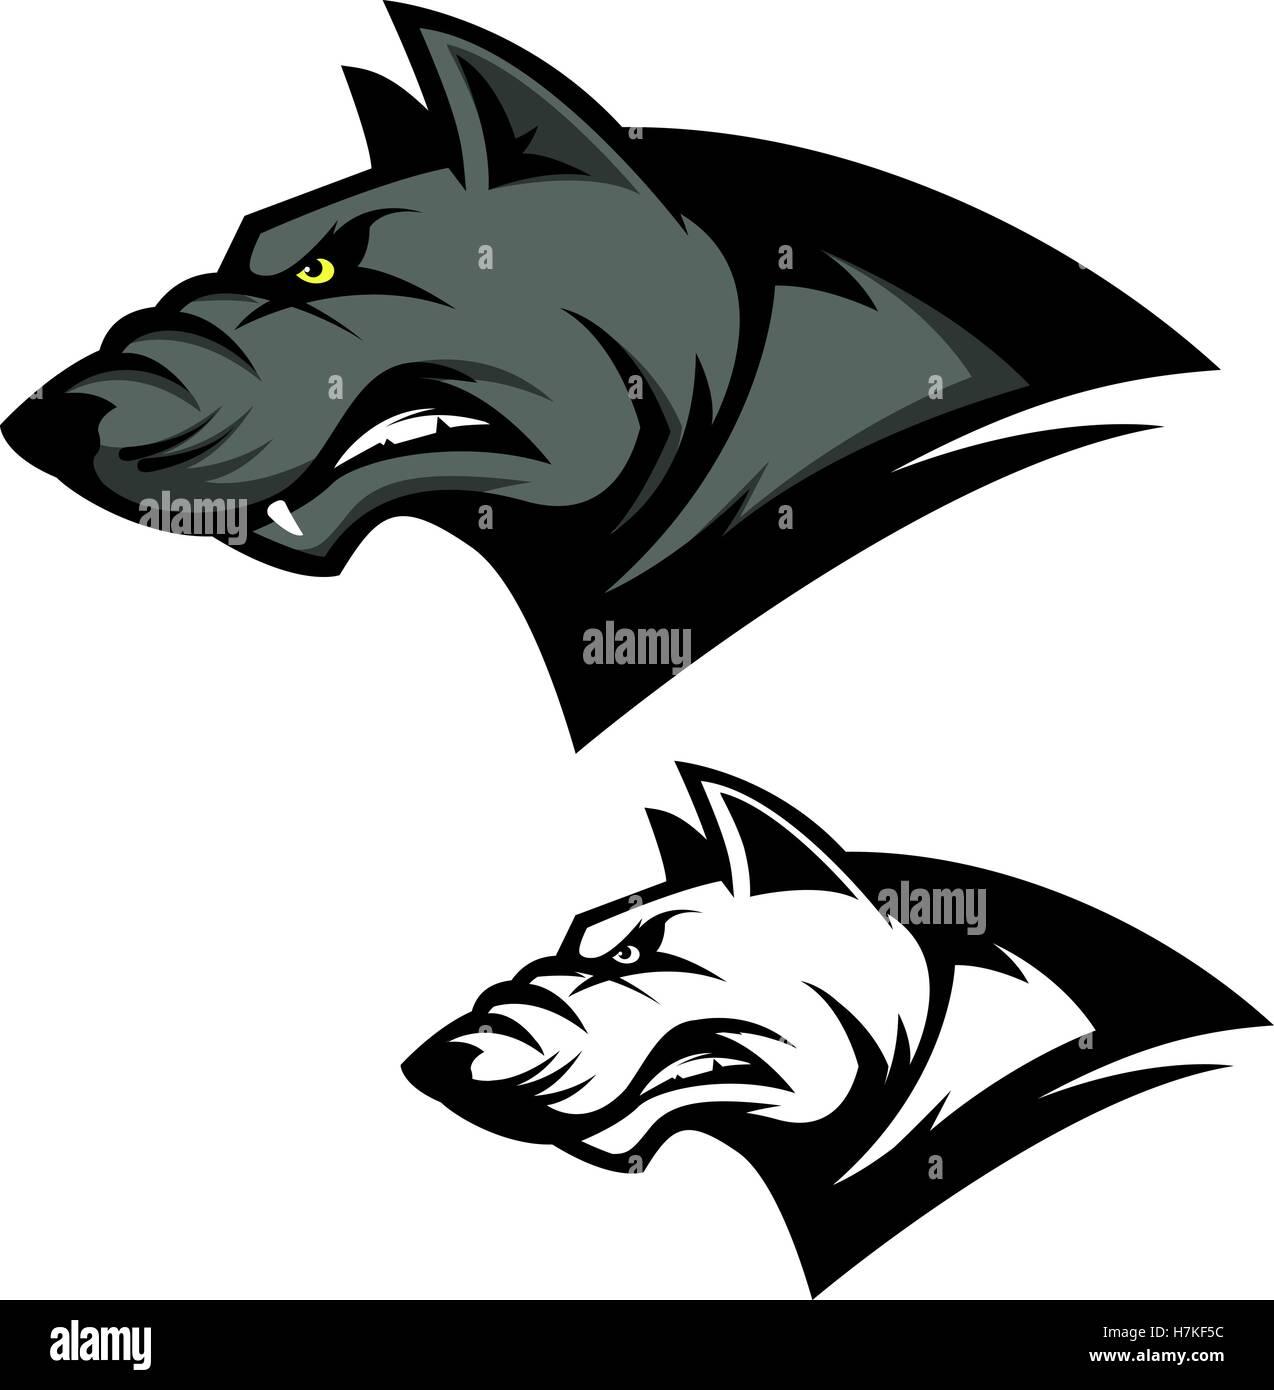 573658f42 Angry wolf head. Sport team mascot. Design element for logo, label, emblem,  sign, brand mark. Vector illustration.